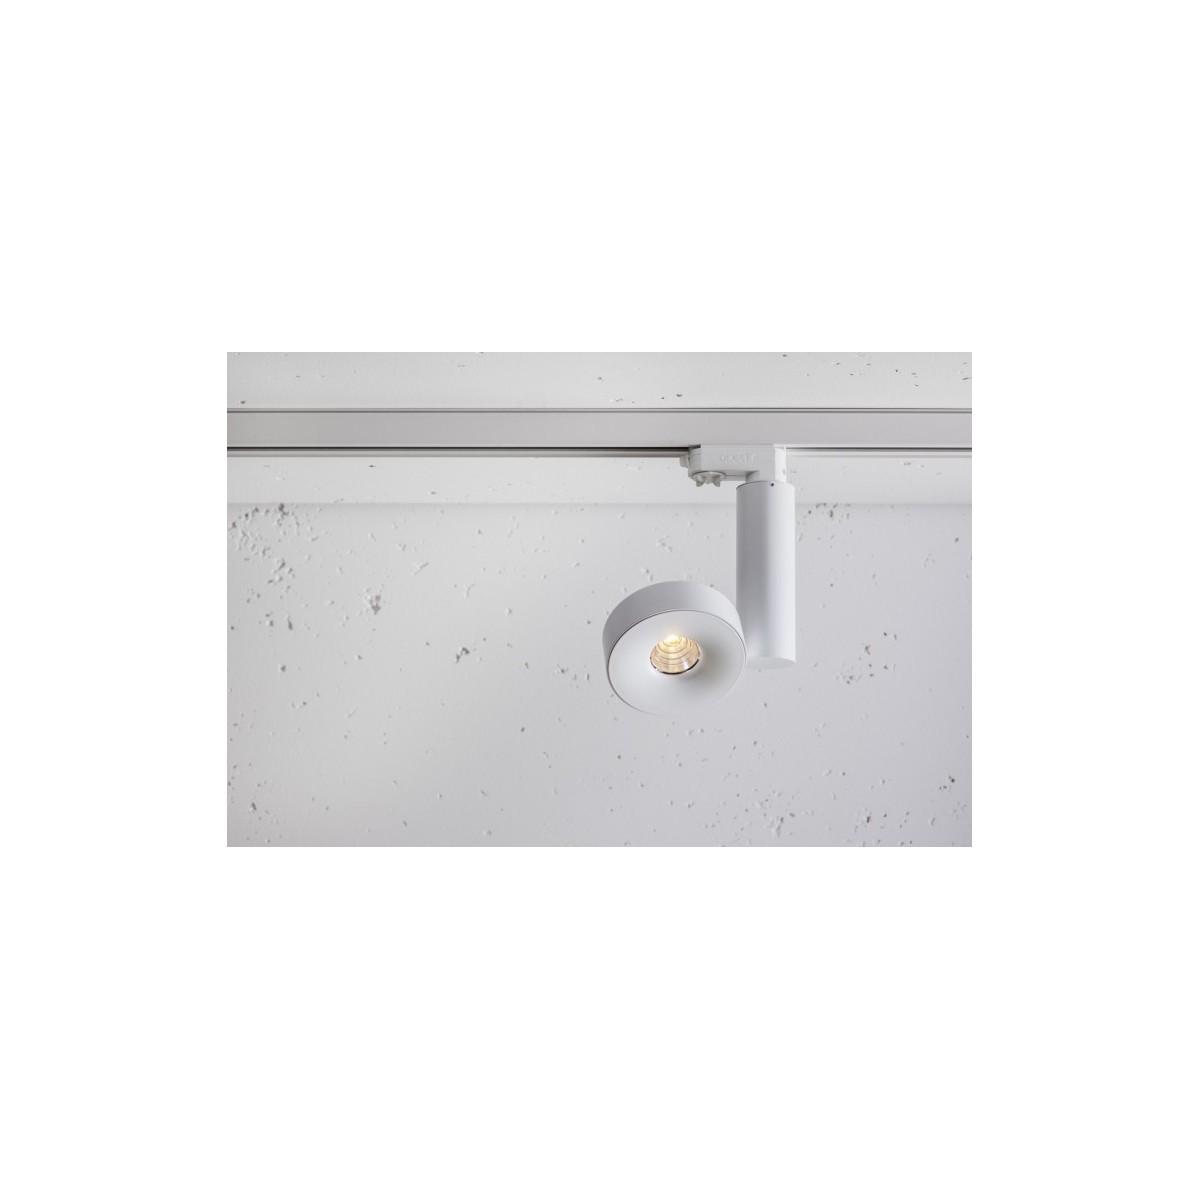 Labra ROBOTIC R1 edge.LED 7.5W Adaptor 3F 7-0710